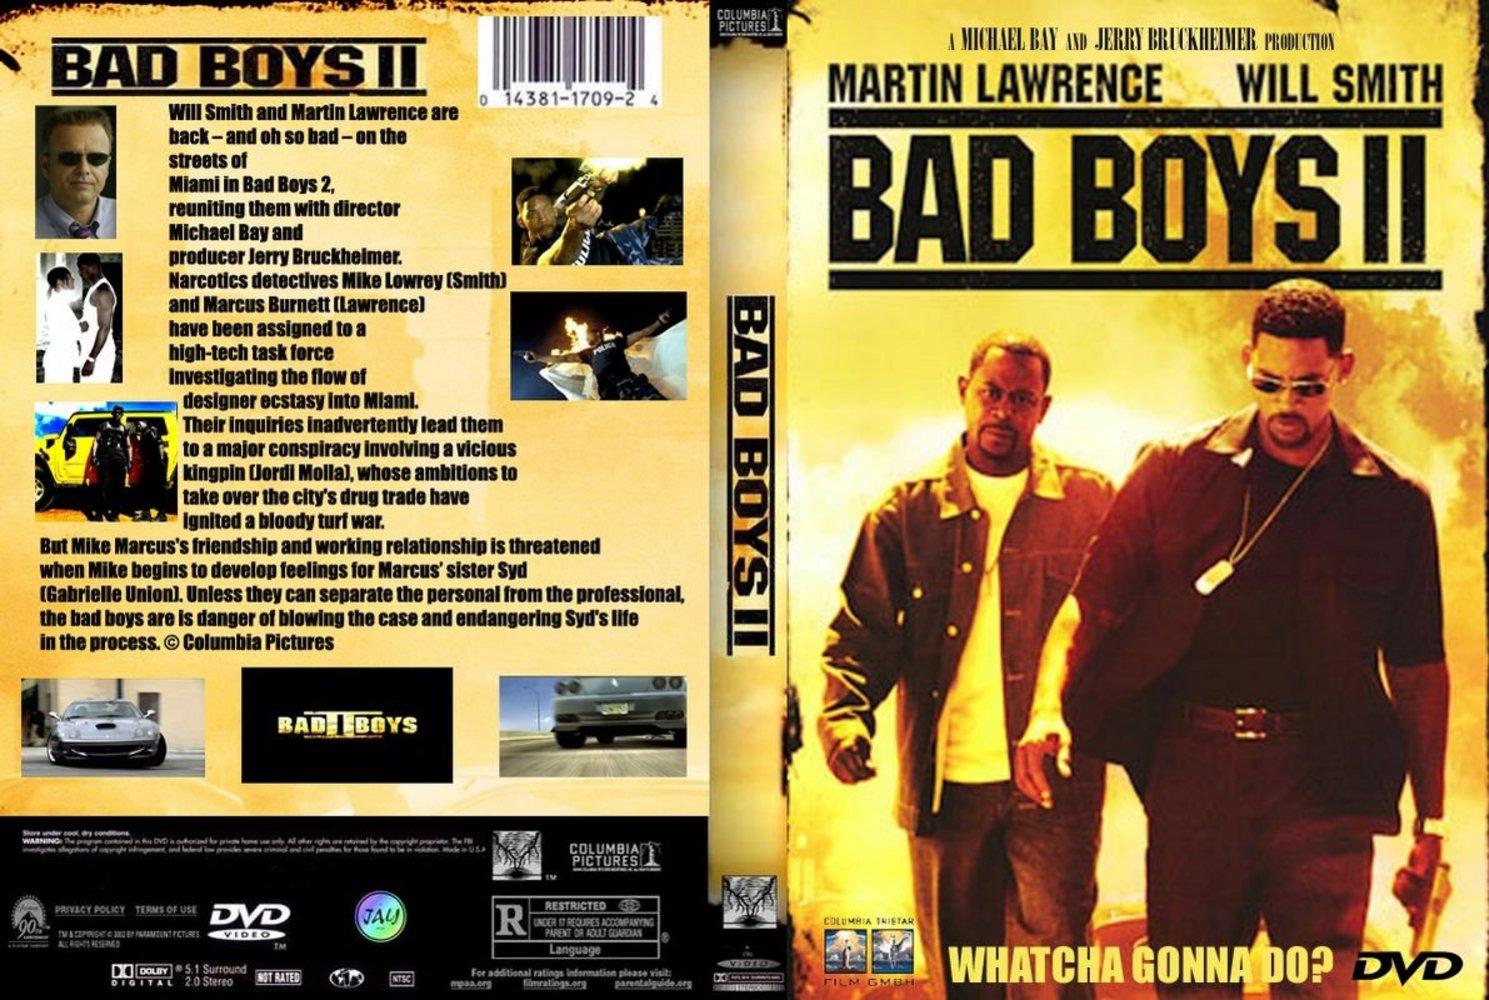 Baixar Filme Bad Boys 2 DVDRip XviD Dual Audio